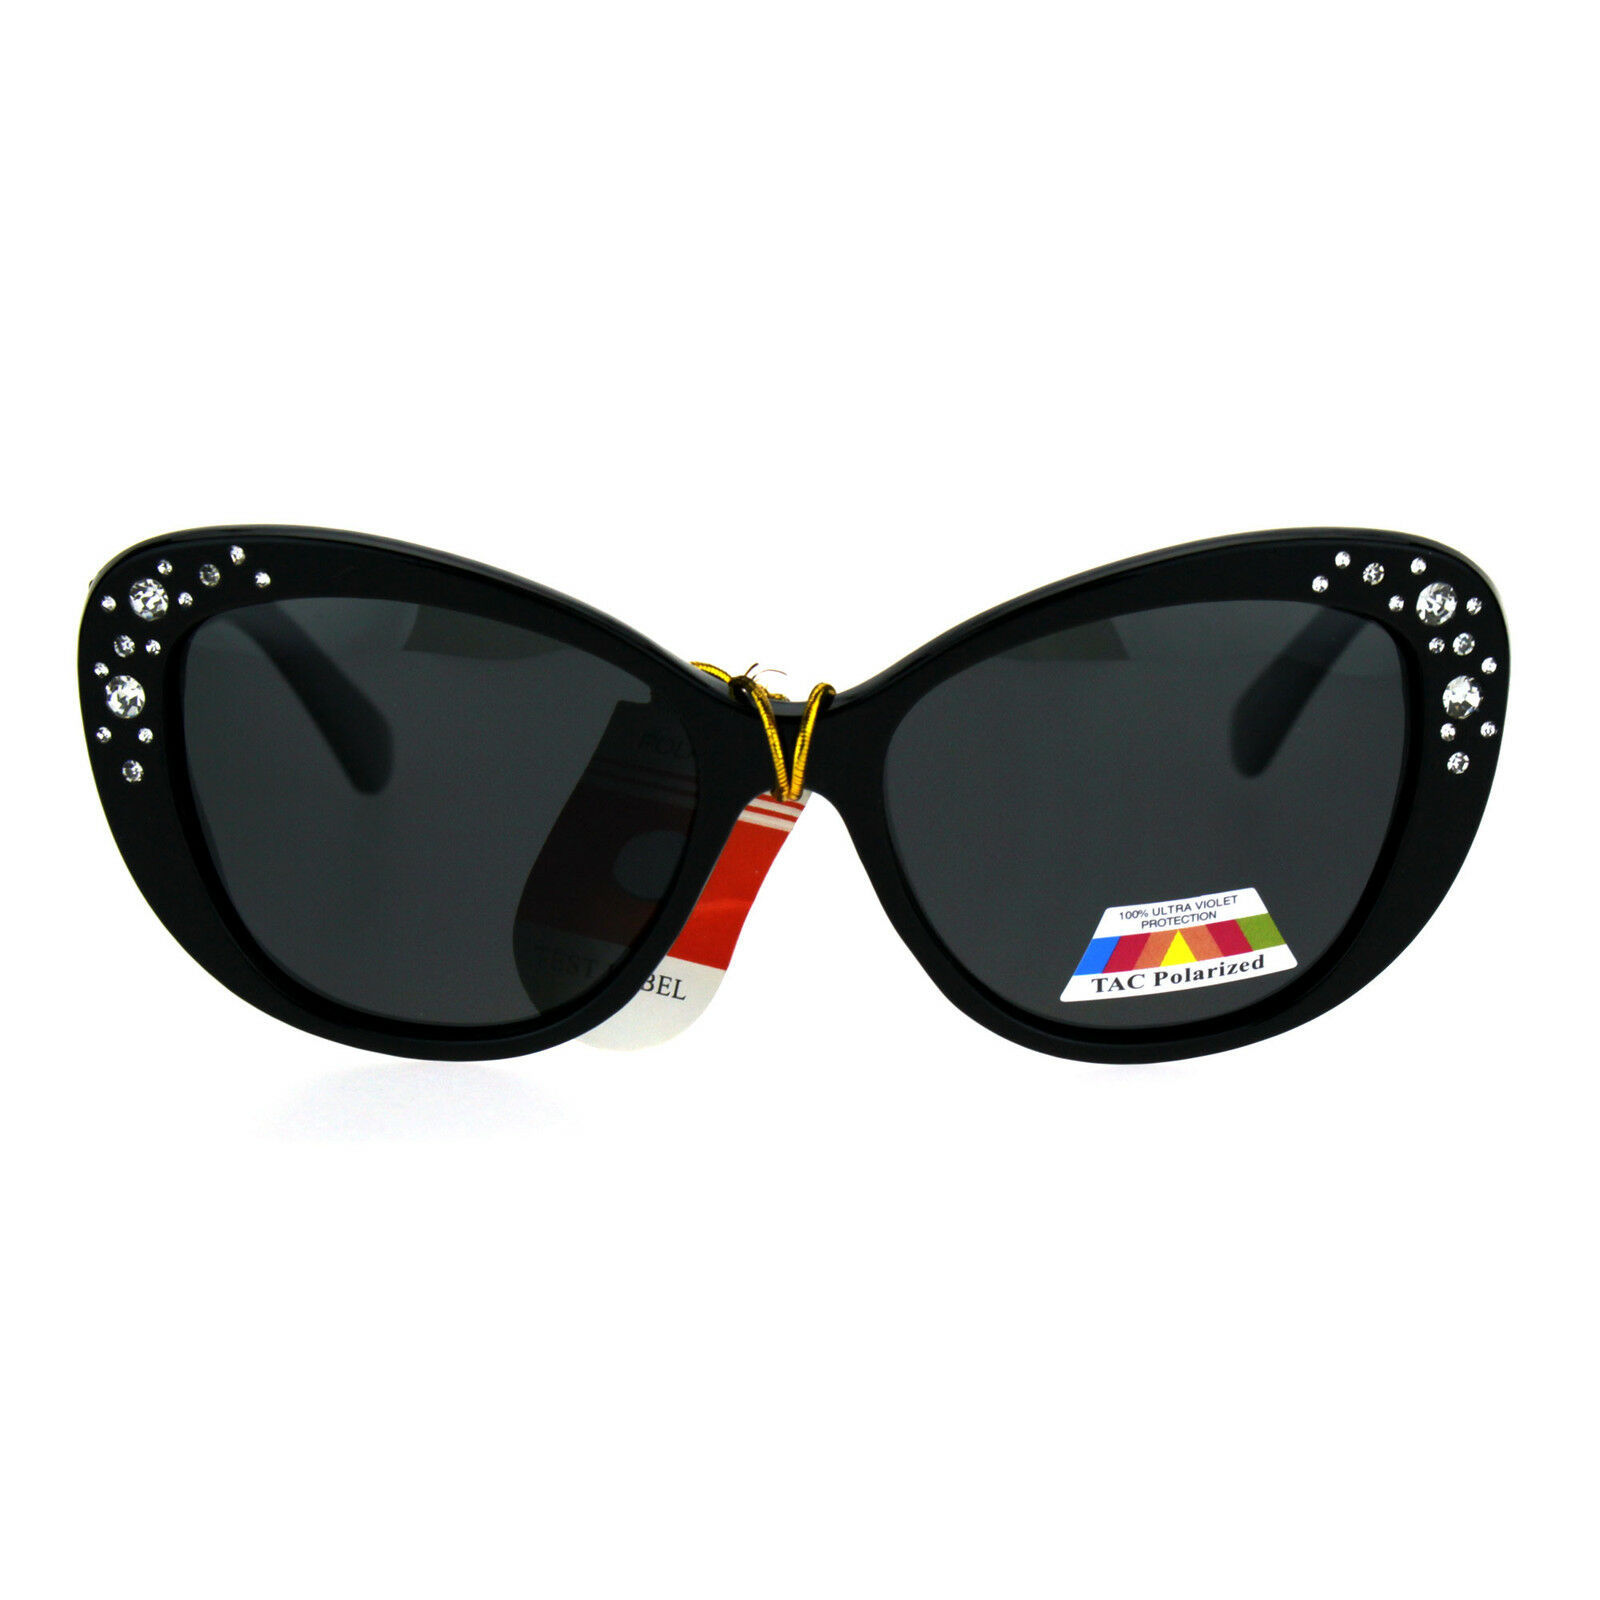 Antiglare Polarized Rhinestone Bling Thick Plastic Cat Eye Diva Sunglasses